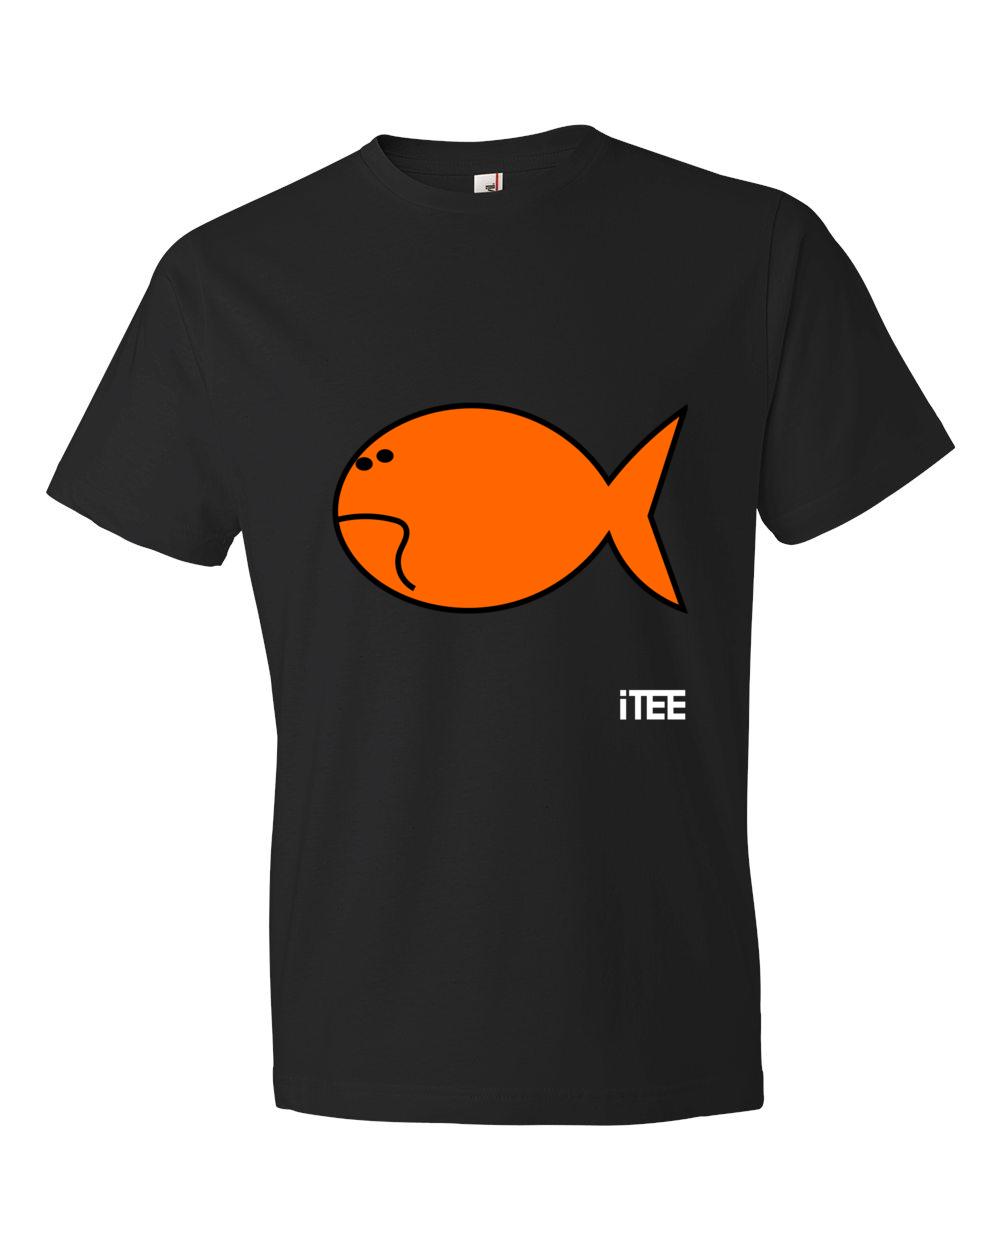 Sad-Fish-Lightweight-Fashion-Short-Sleeve-T-Shirt-by-iTEE.com